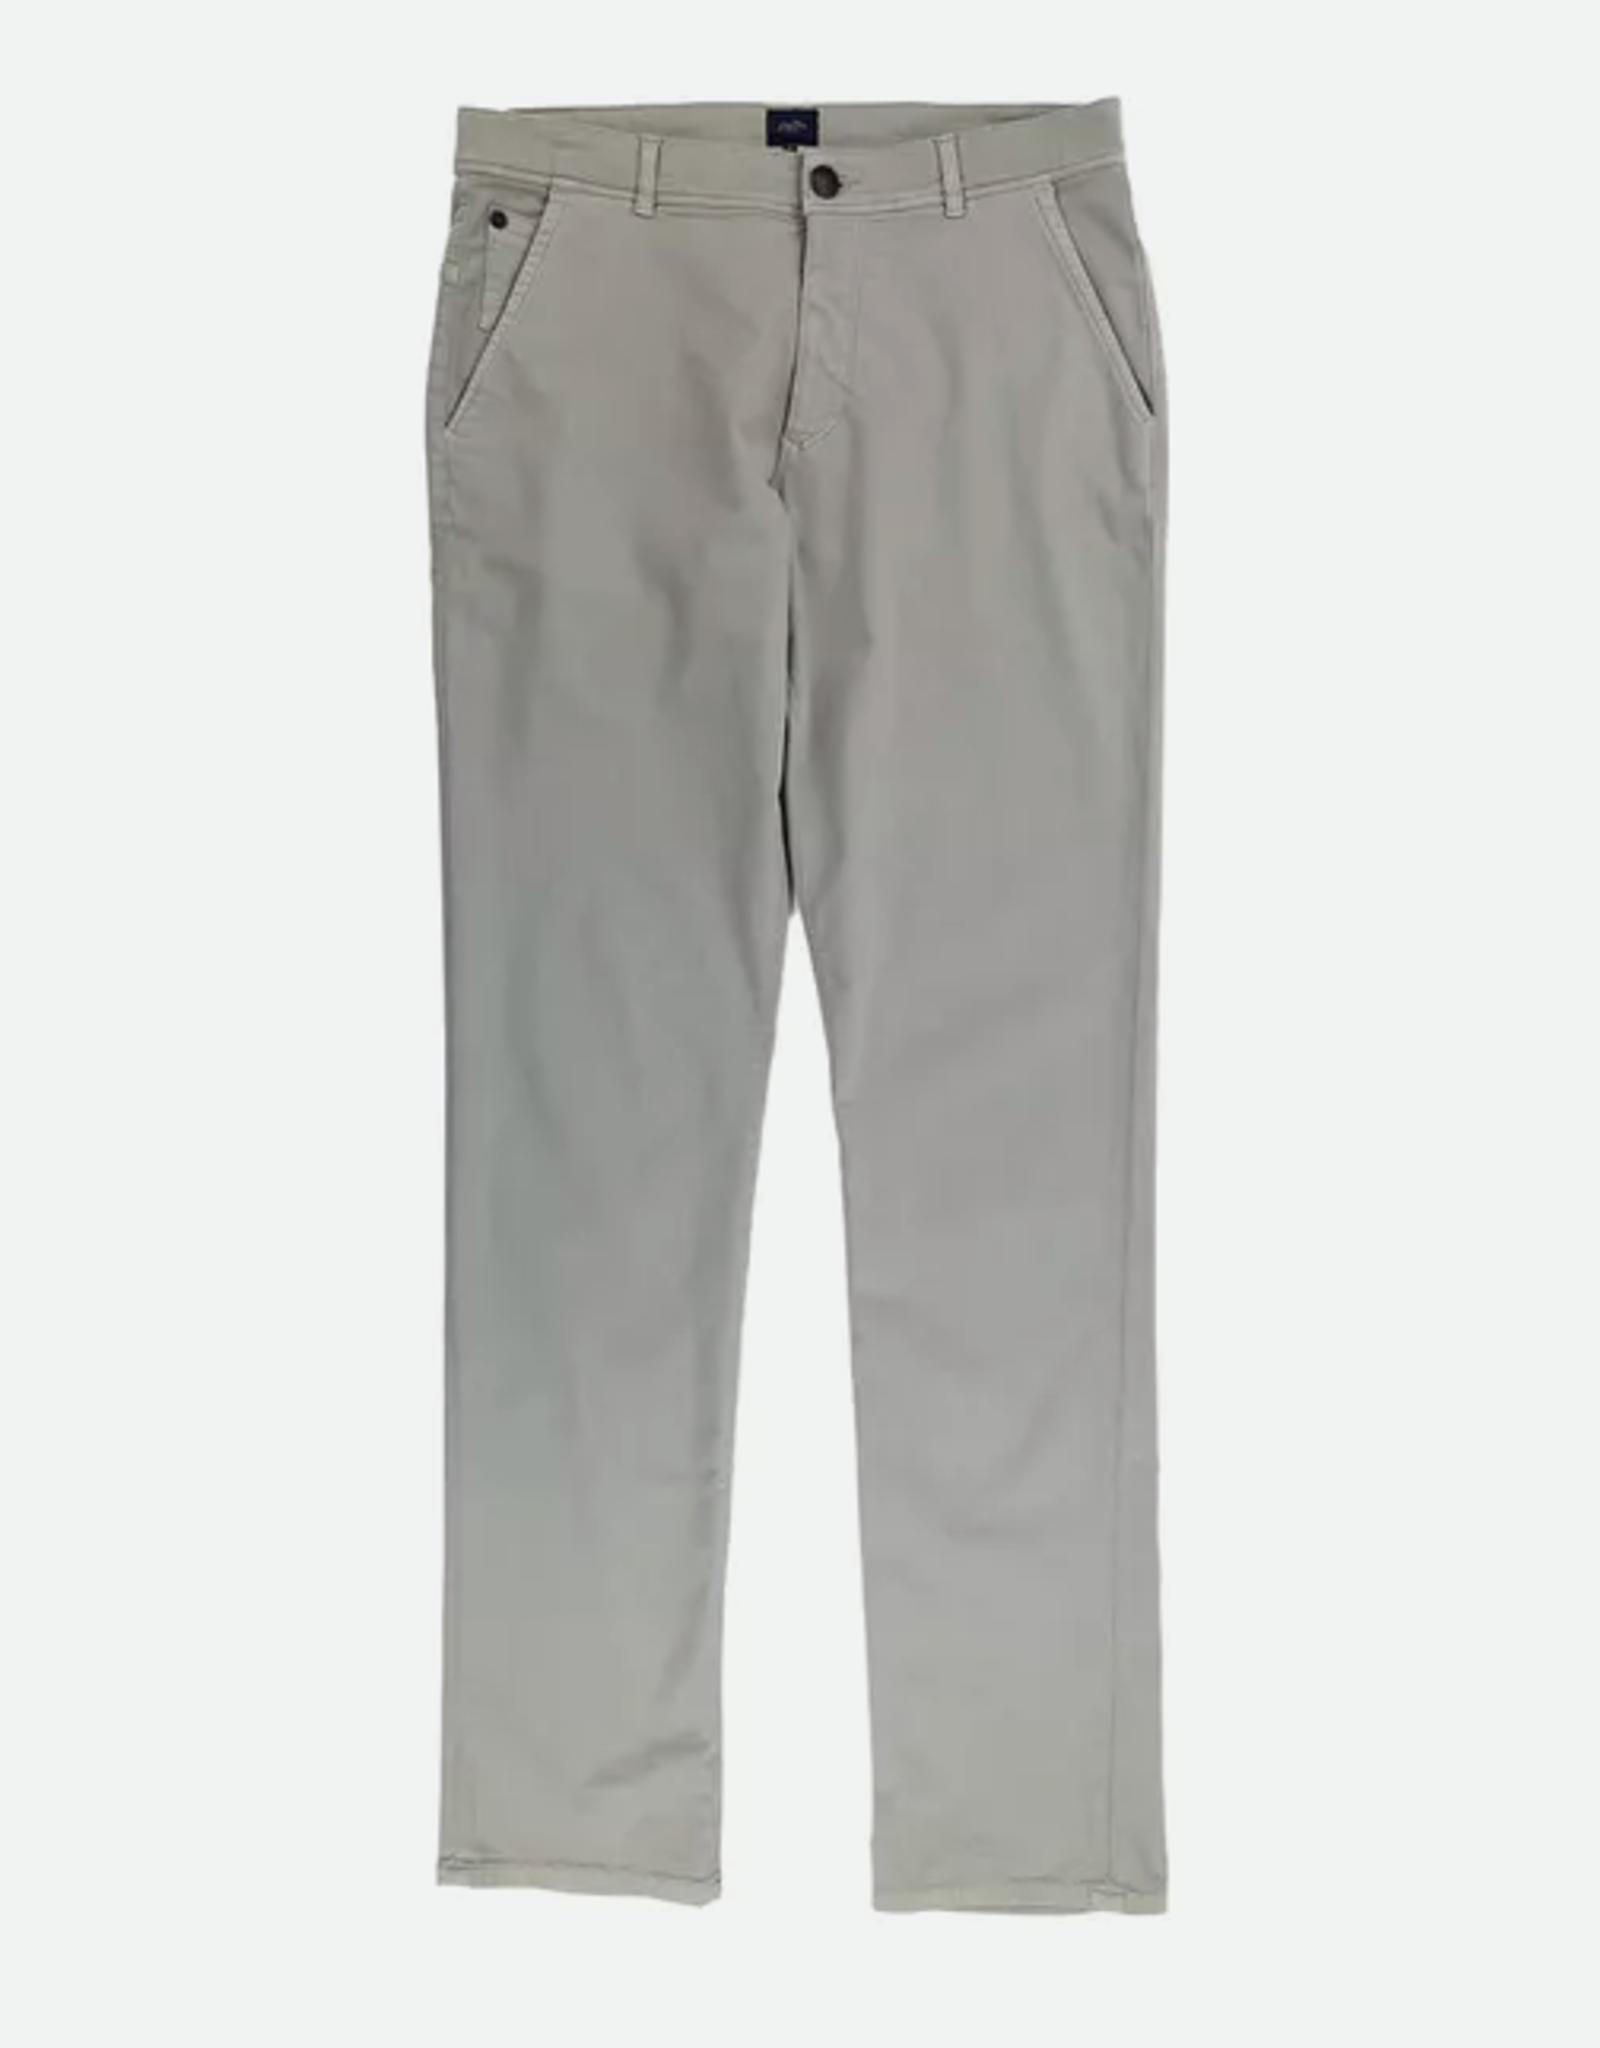 Good Man Brand Grand Lux Twill Pant